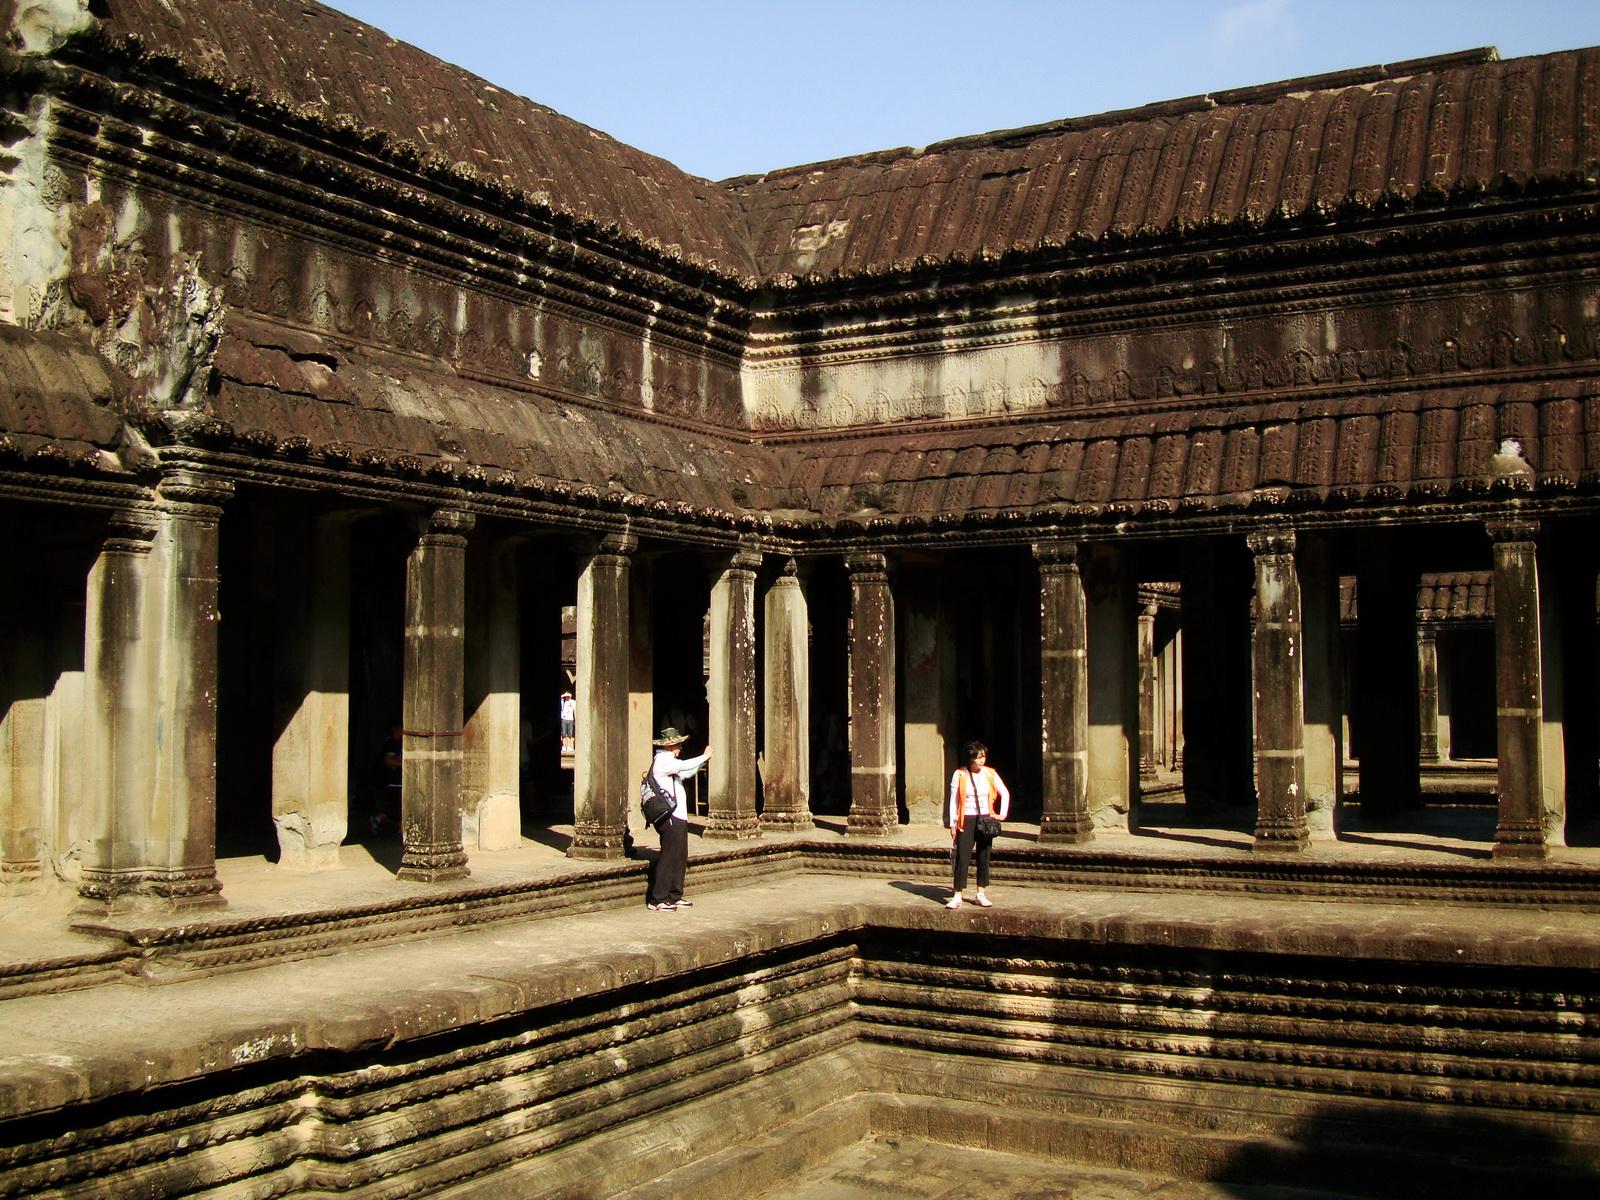 Angkor Wat inner sanctuary gallery columns and passageways 14